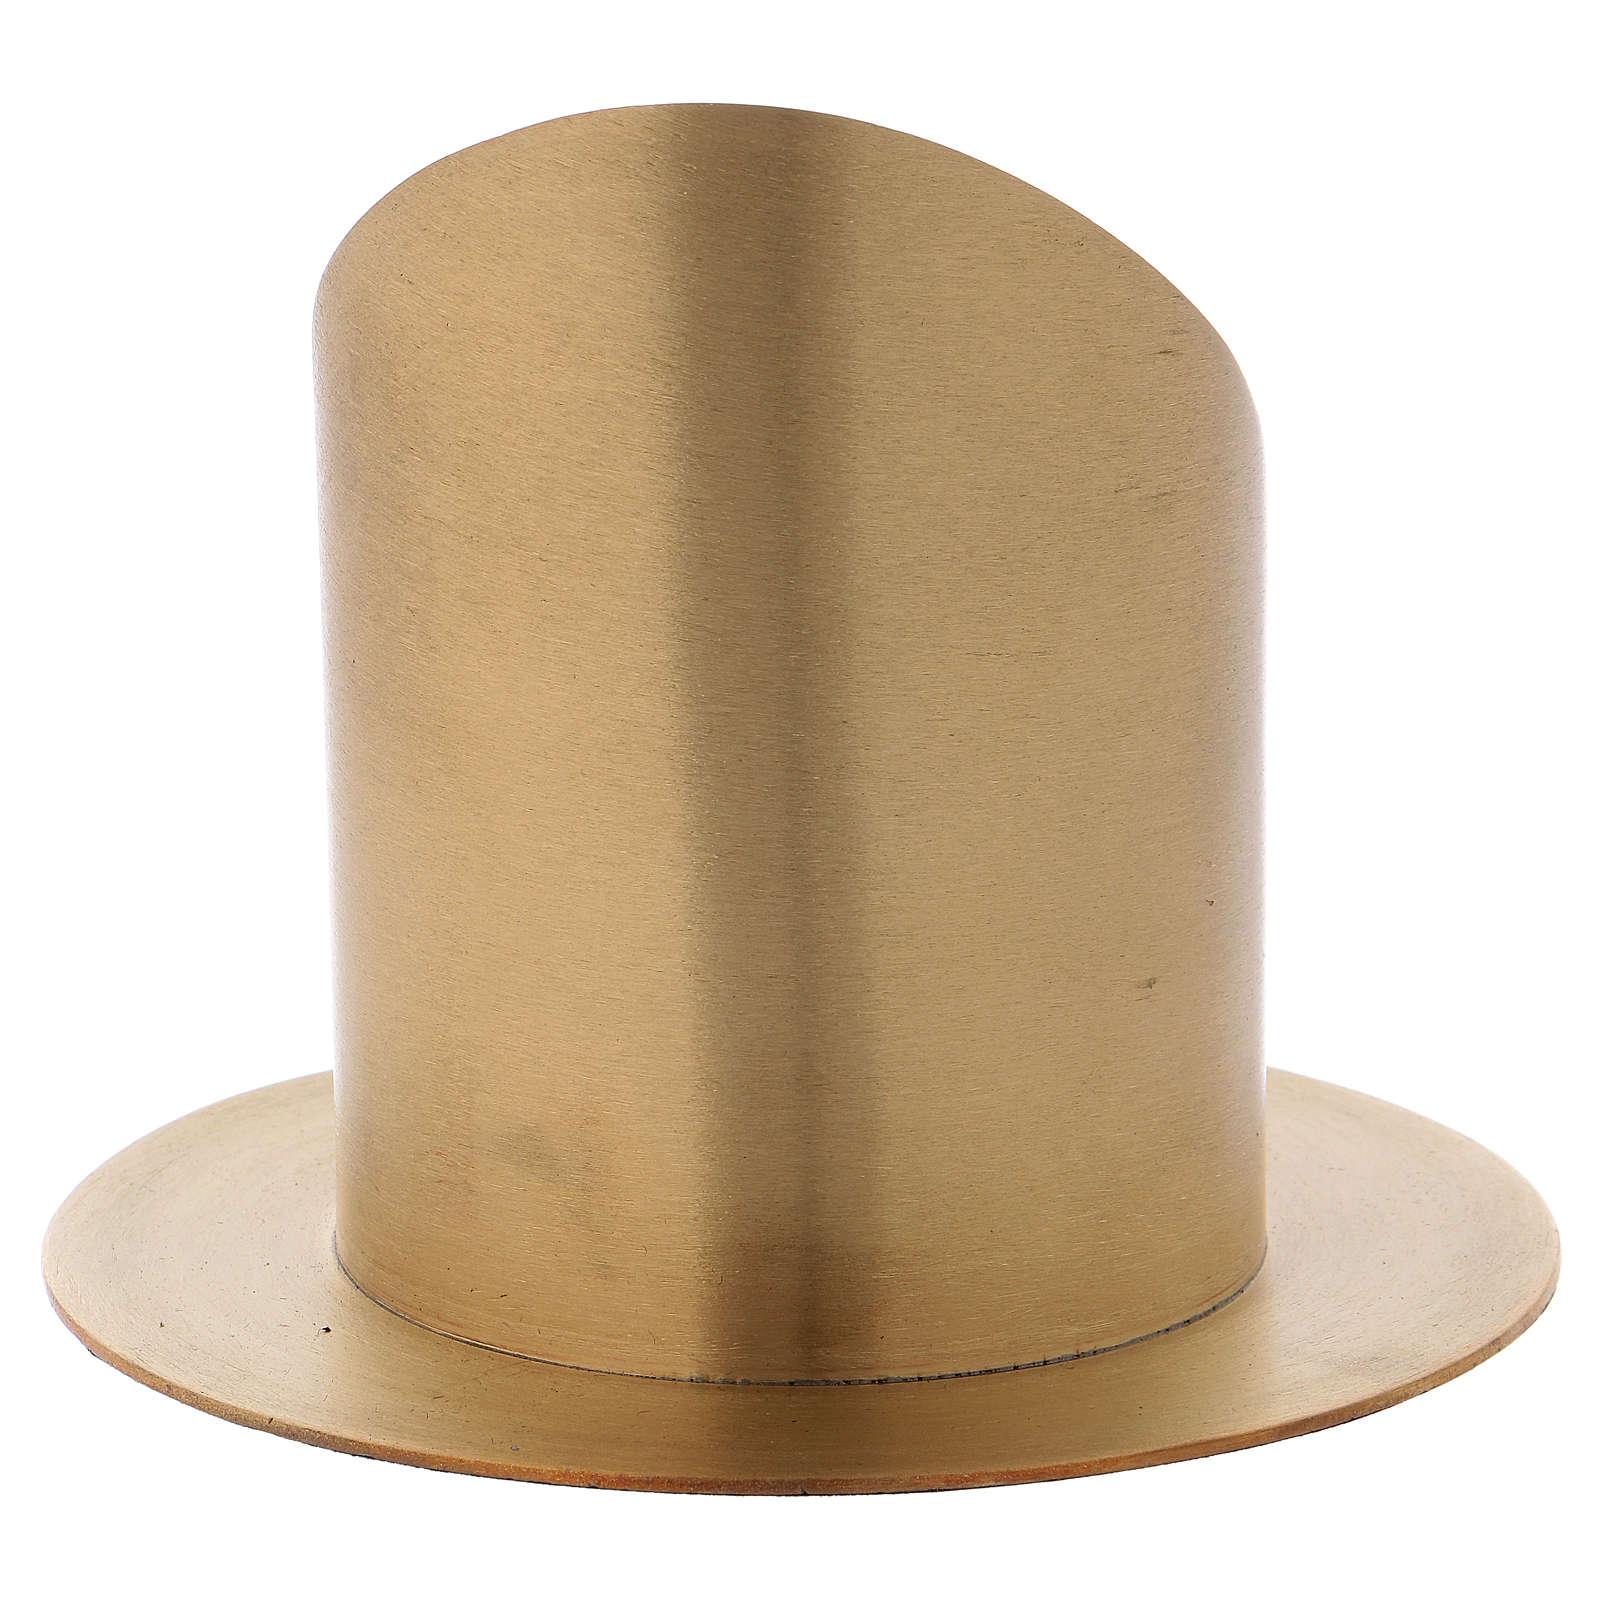 Portacero stile moderno cilindrico diam. 8 cm 4